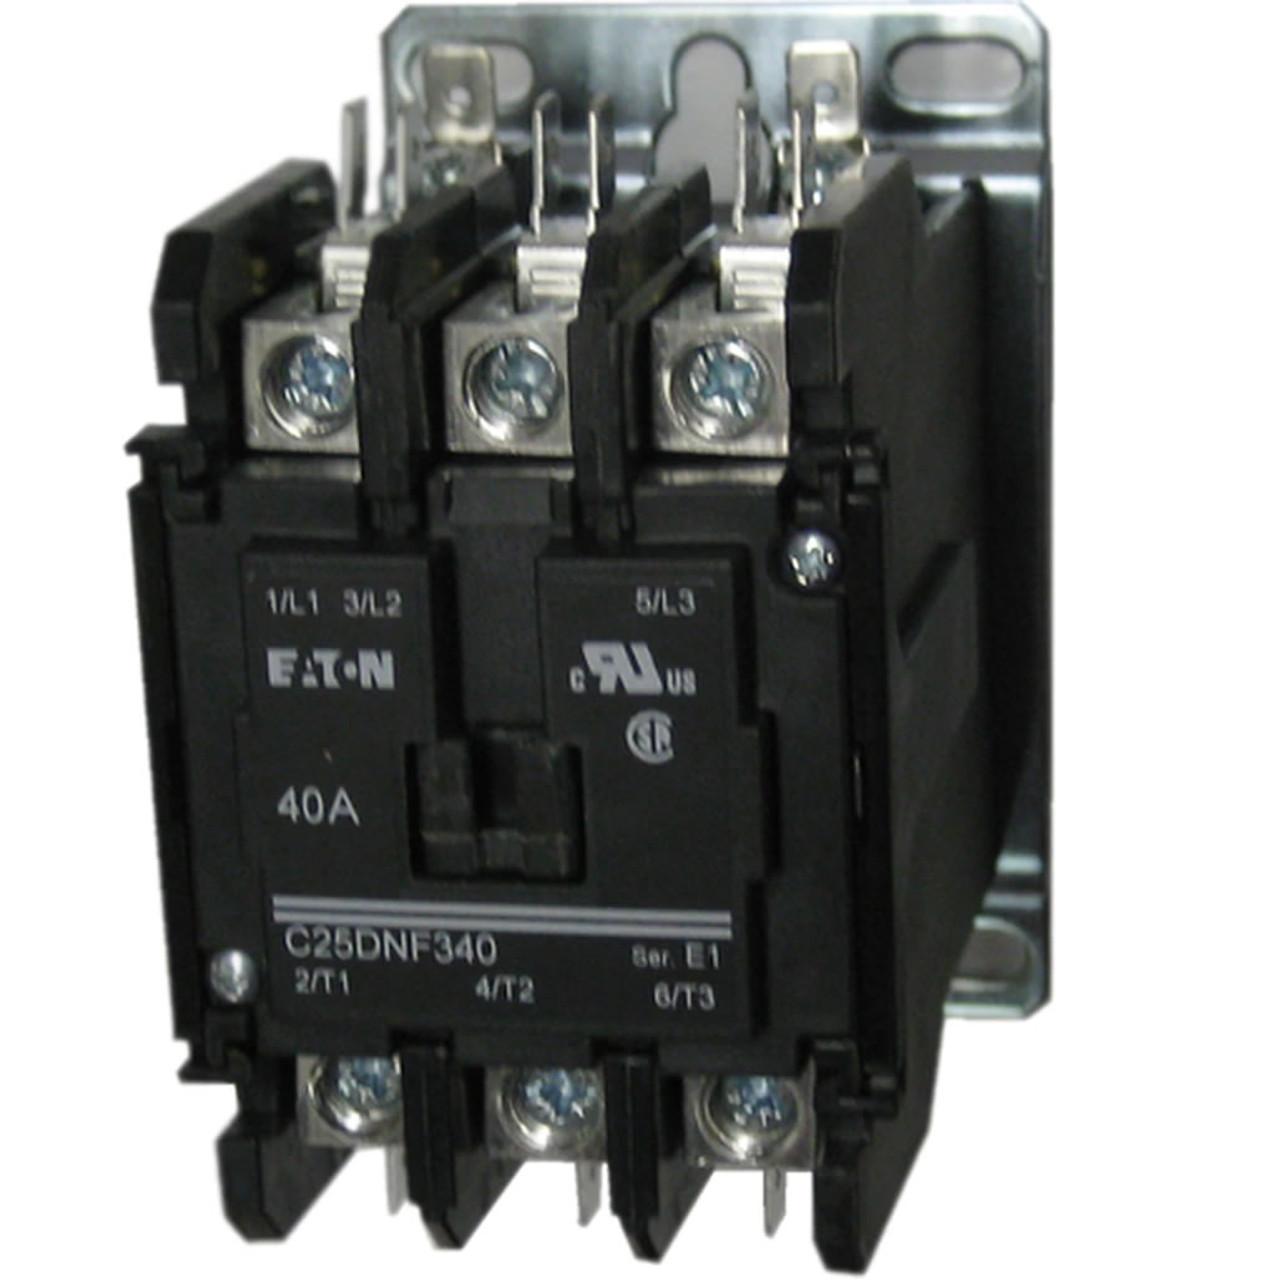 Eaton / Cutler Hammer C25DNF340 definite purpose contactor